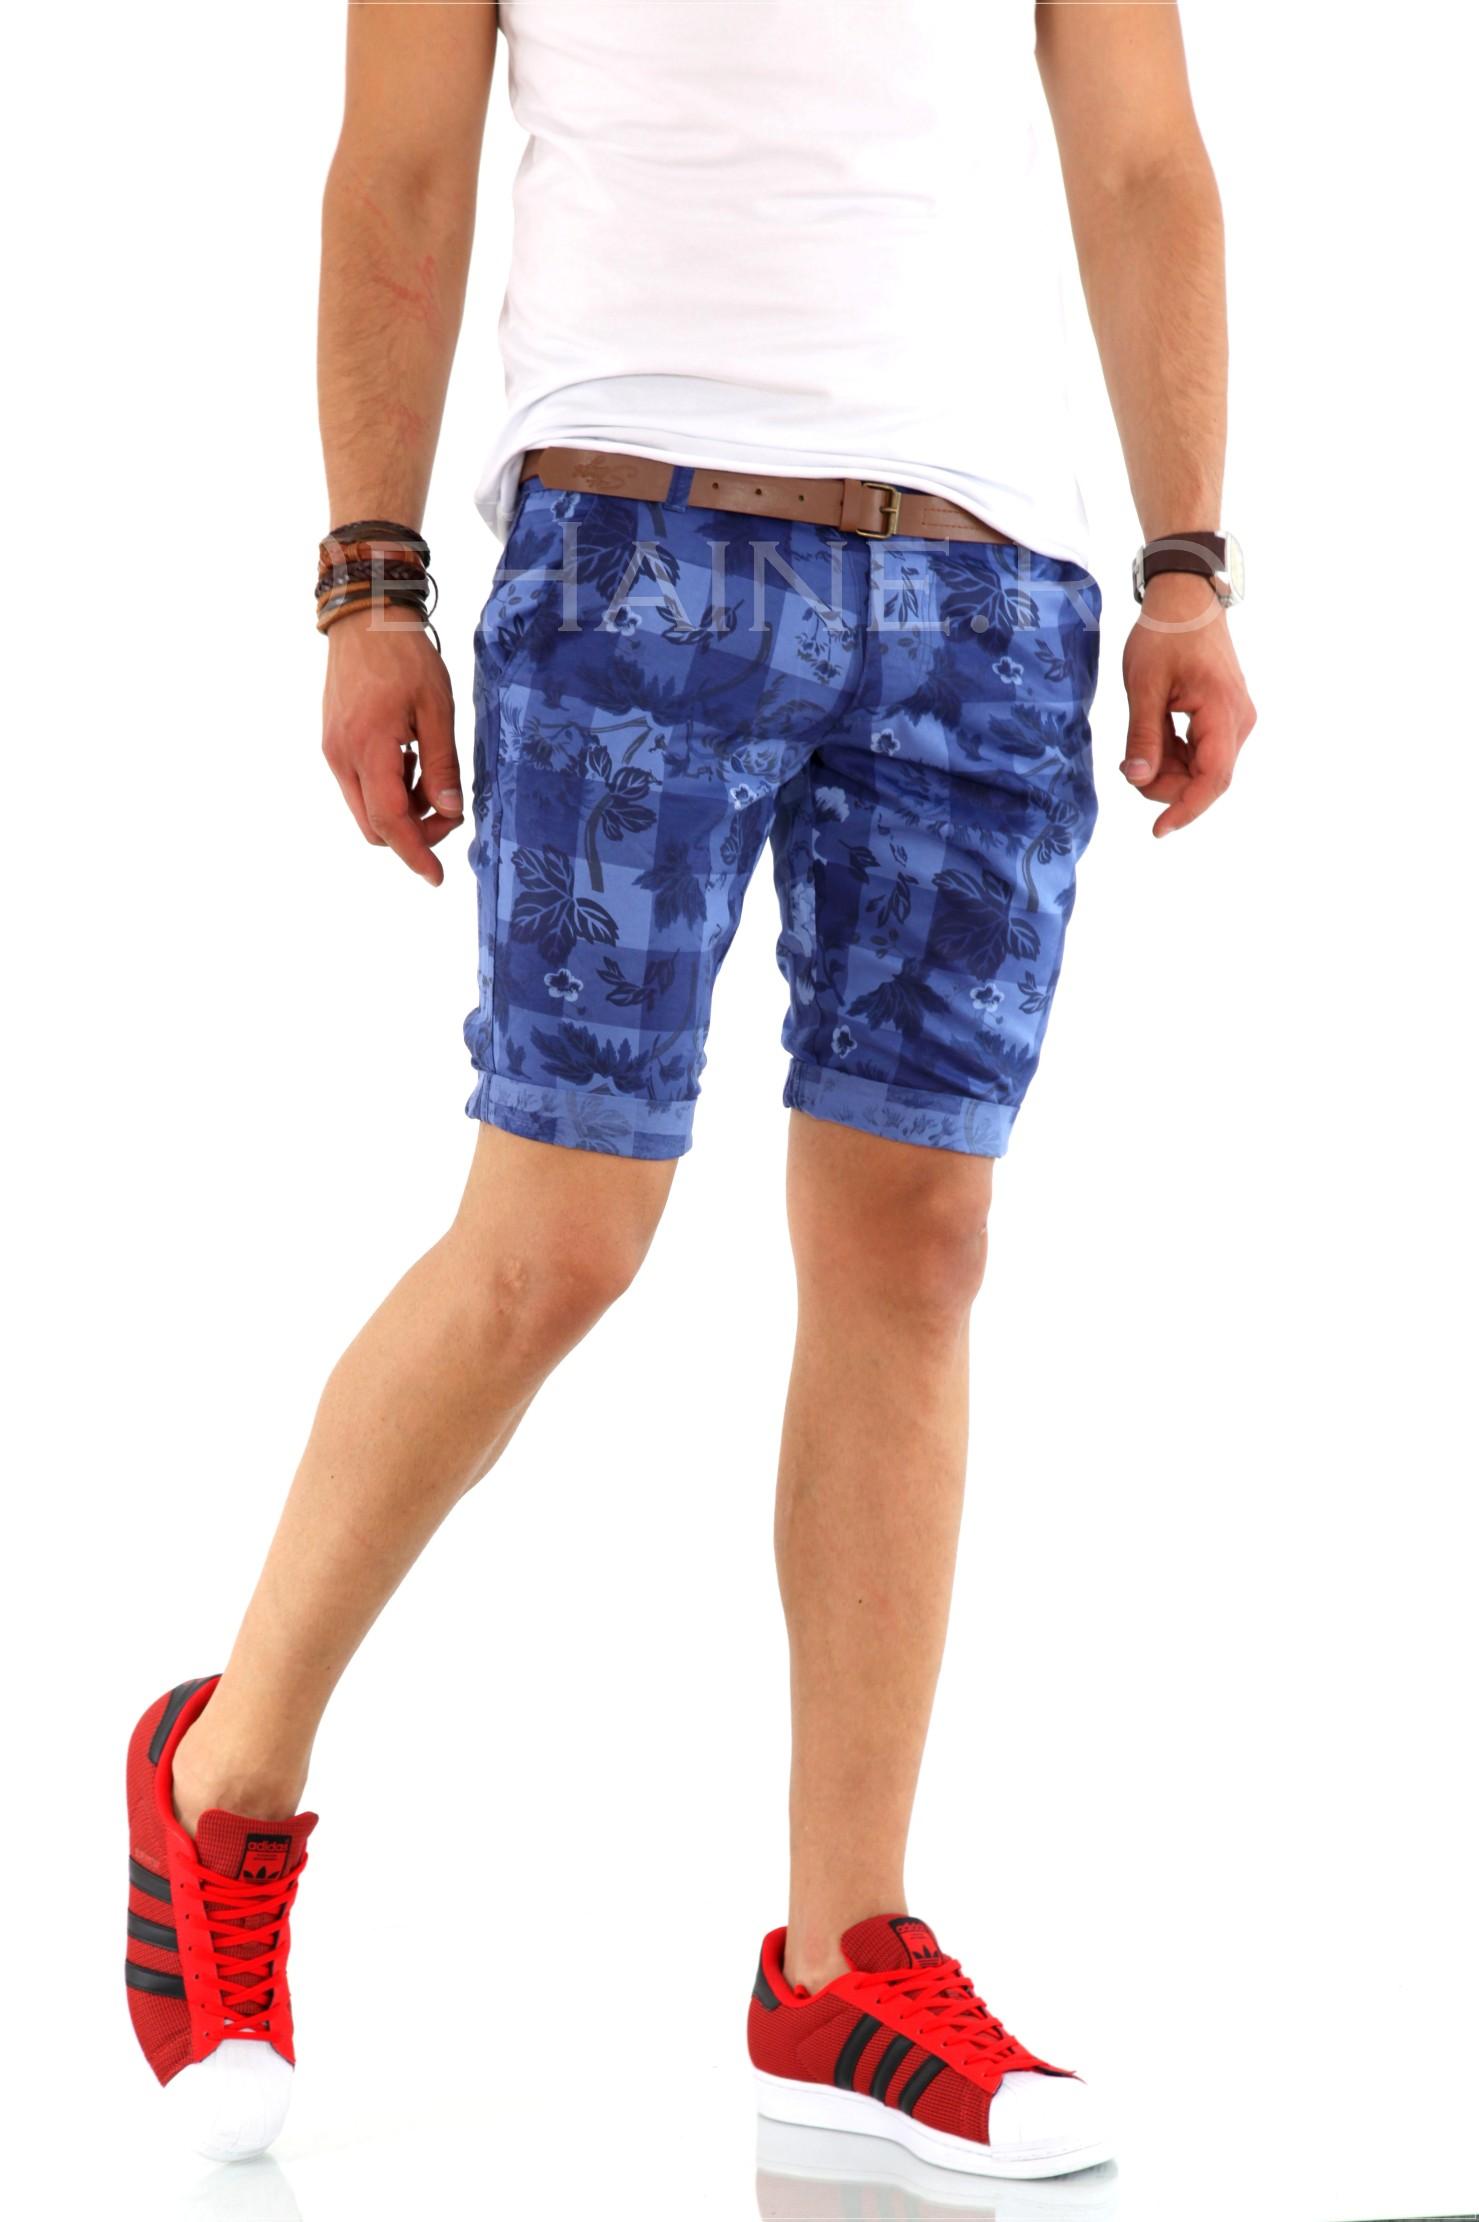 Pantaloni scurti + Cadou ZR 8550 J4-2 - Pantaloni > pantaloni scurti